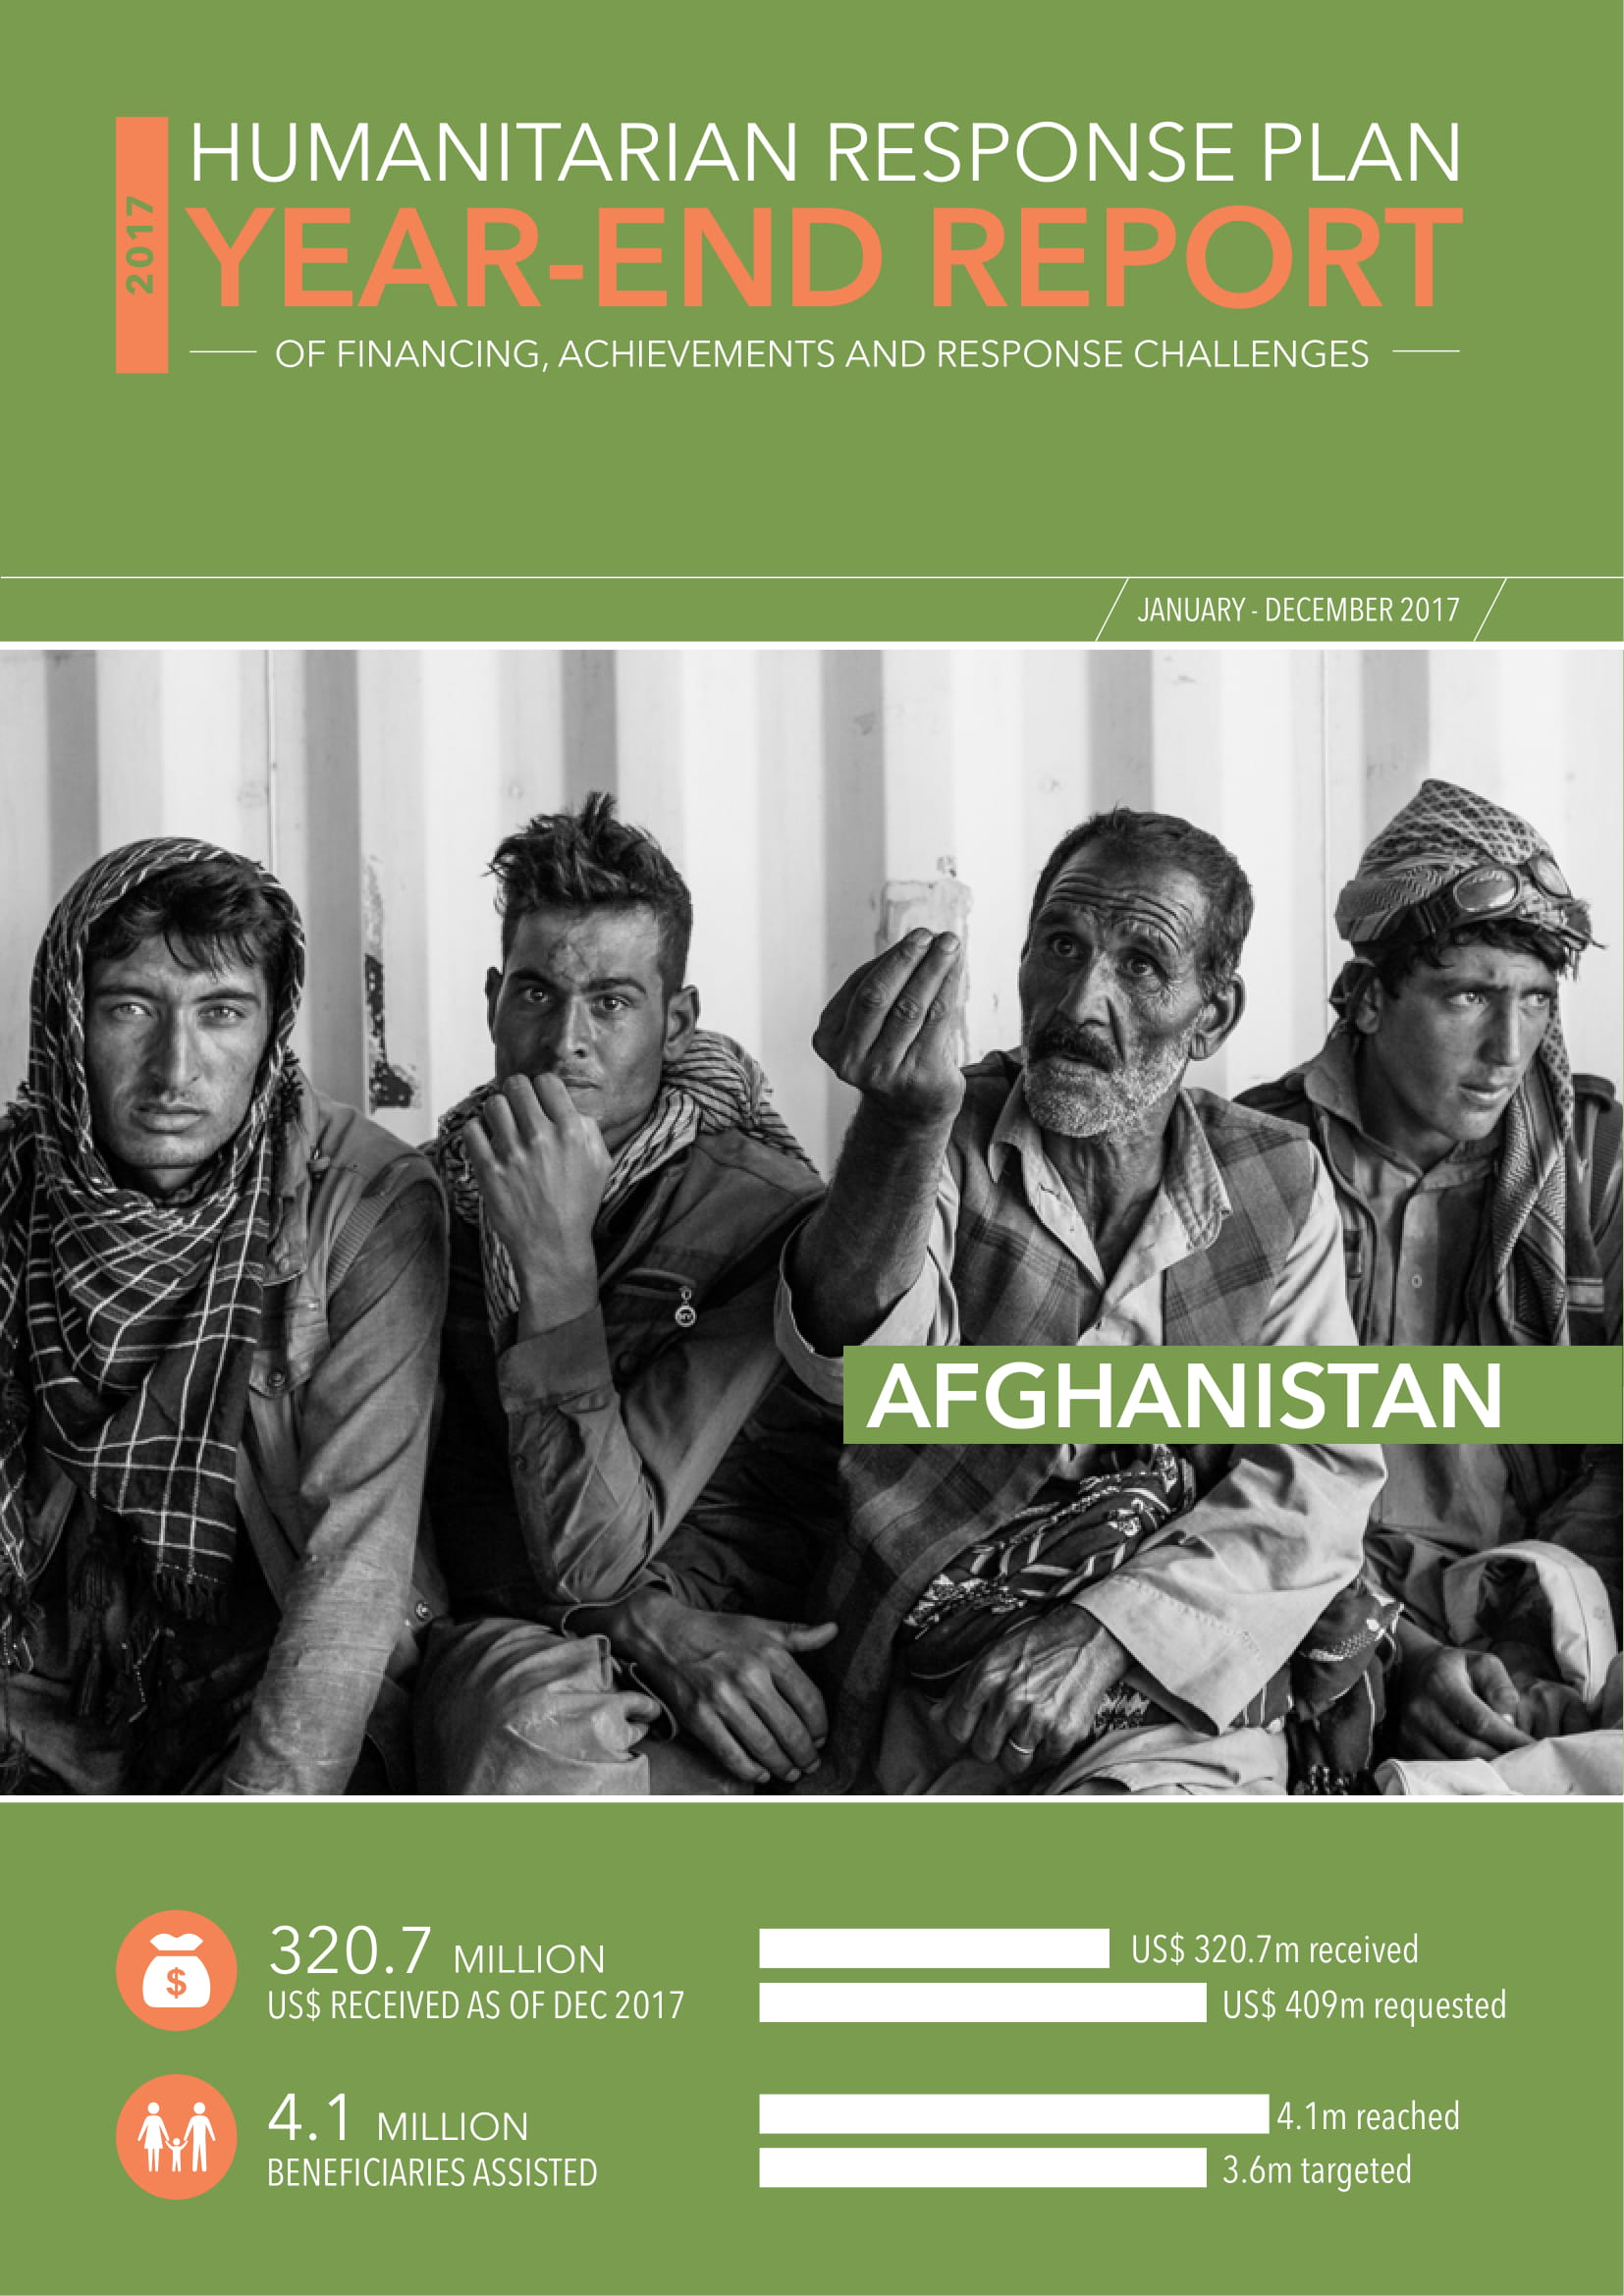 humanitarian response plan year end report example